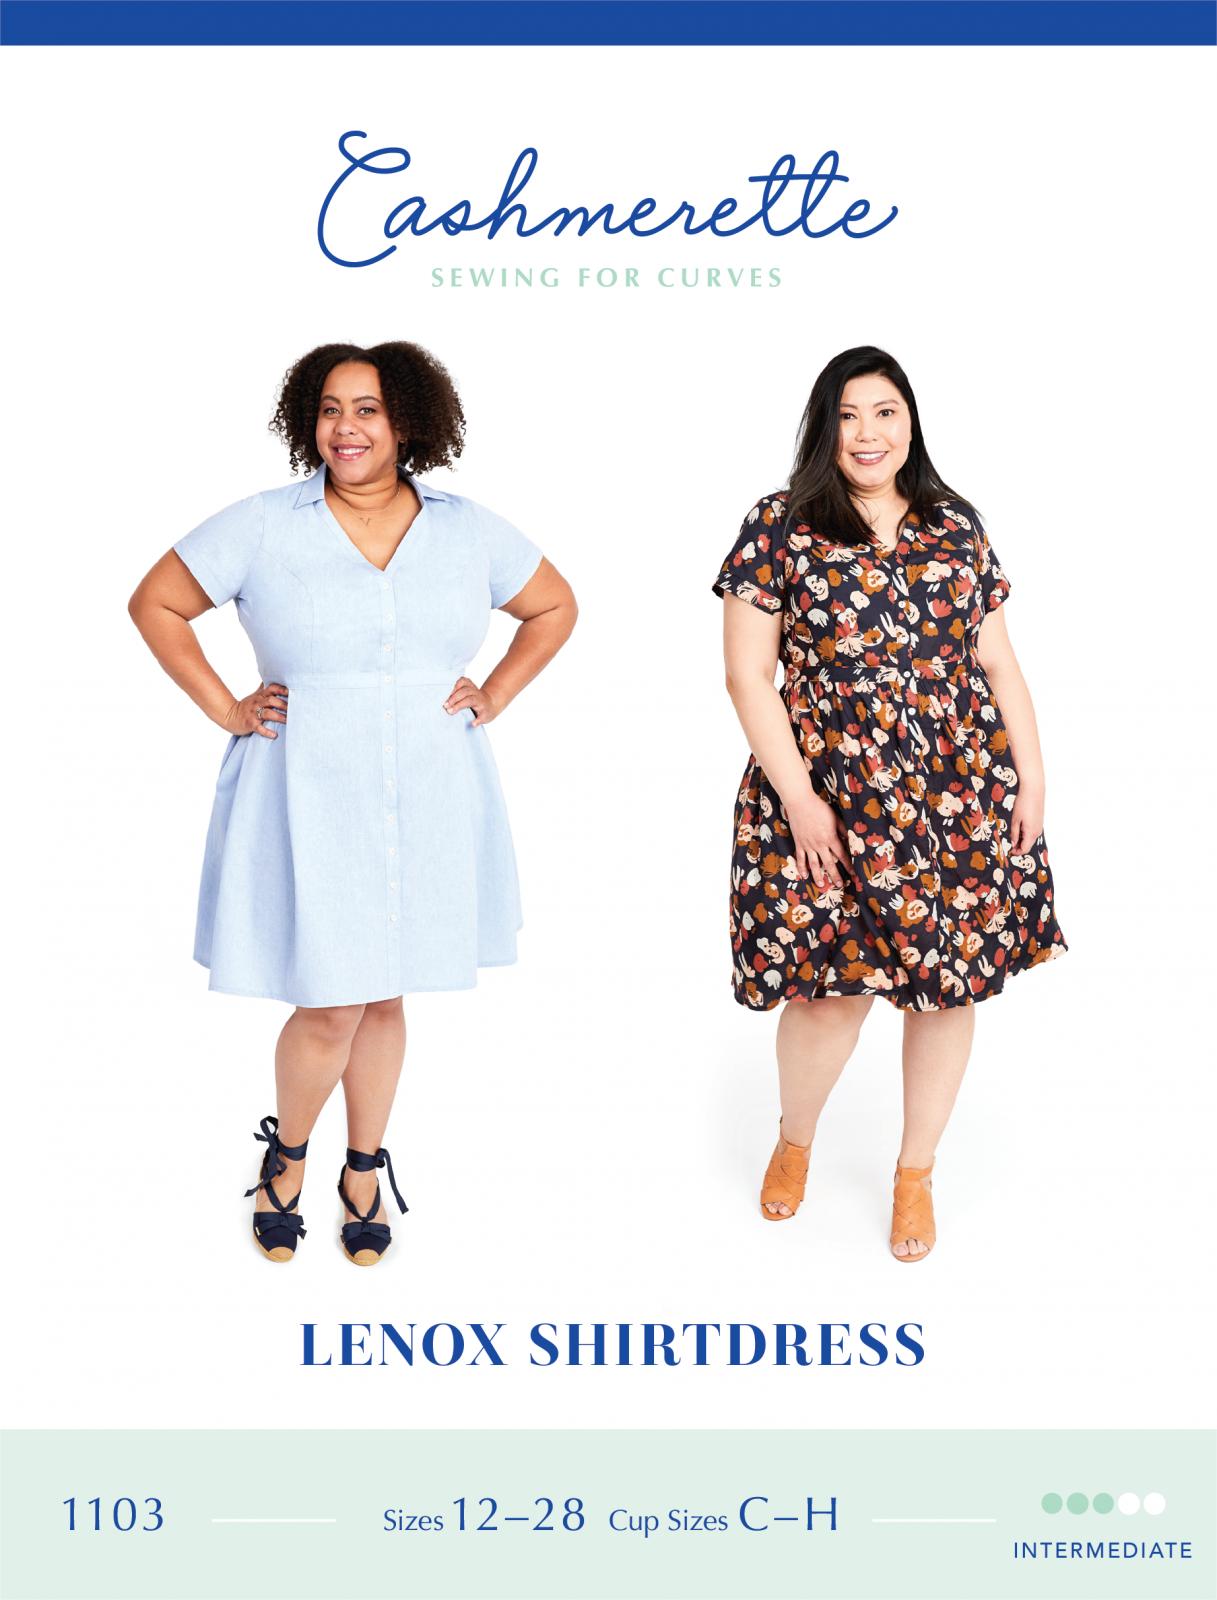 Cashmerette Lenox Shirtdress Pattern